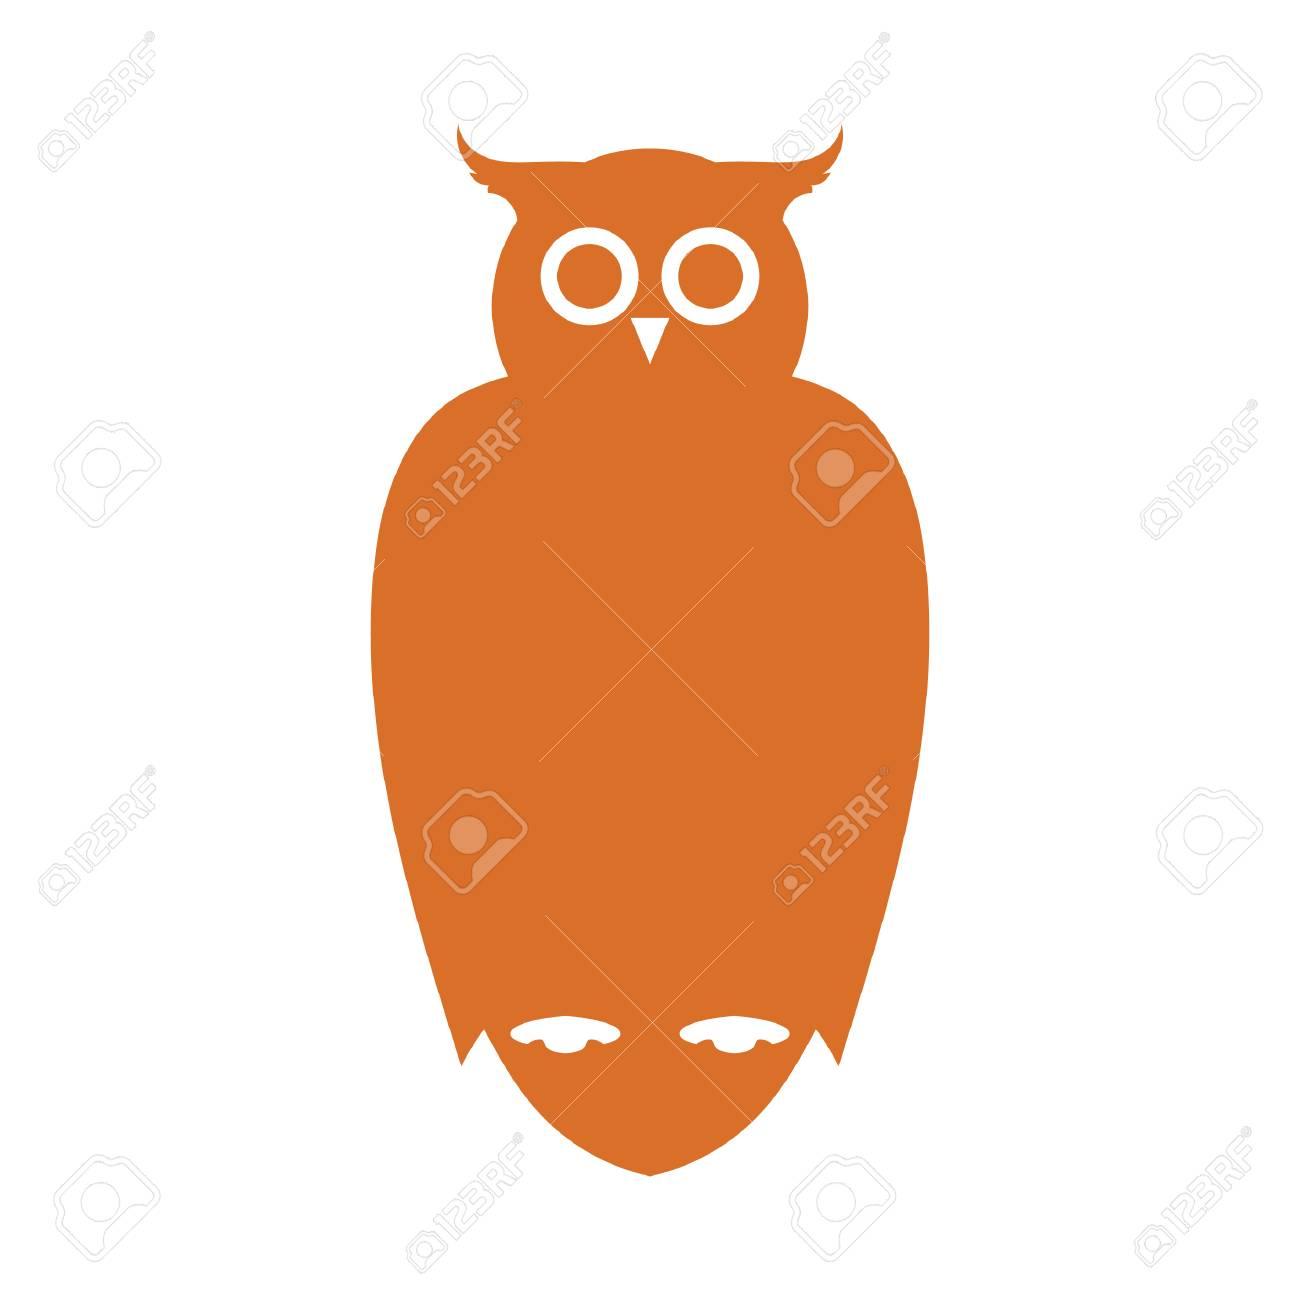 owl - 106672087